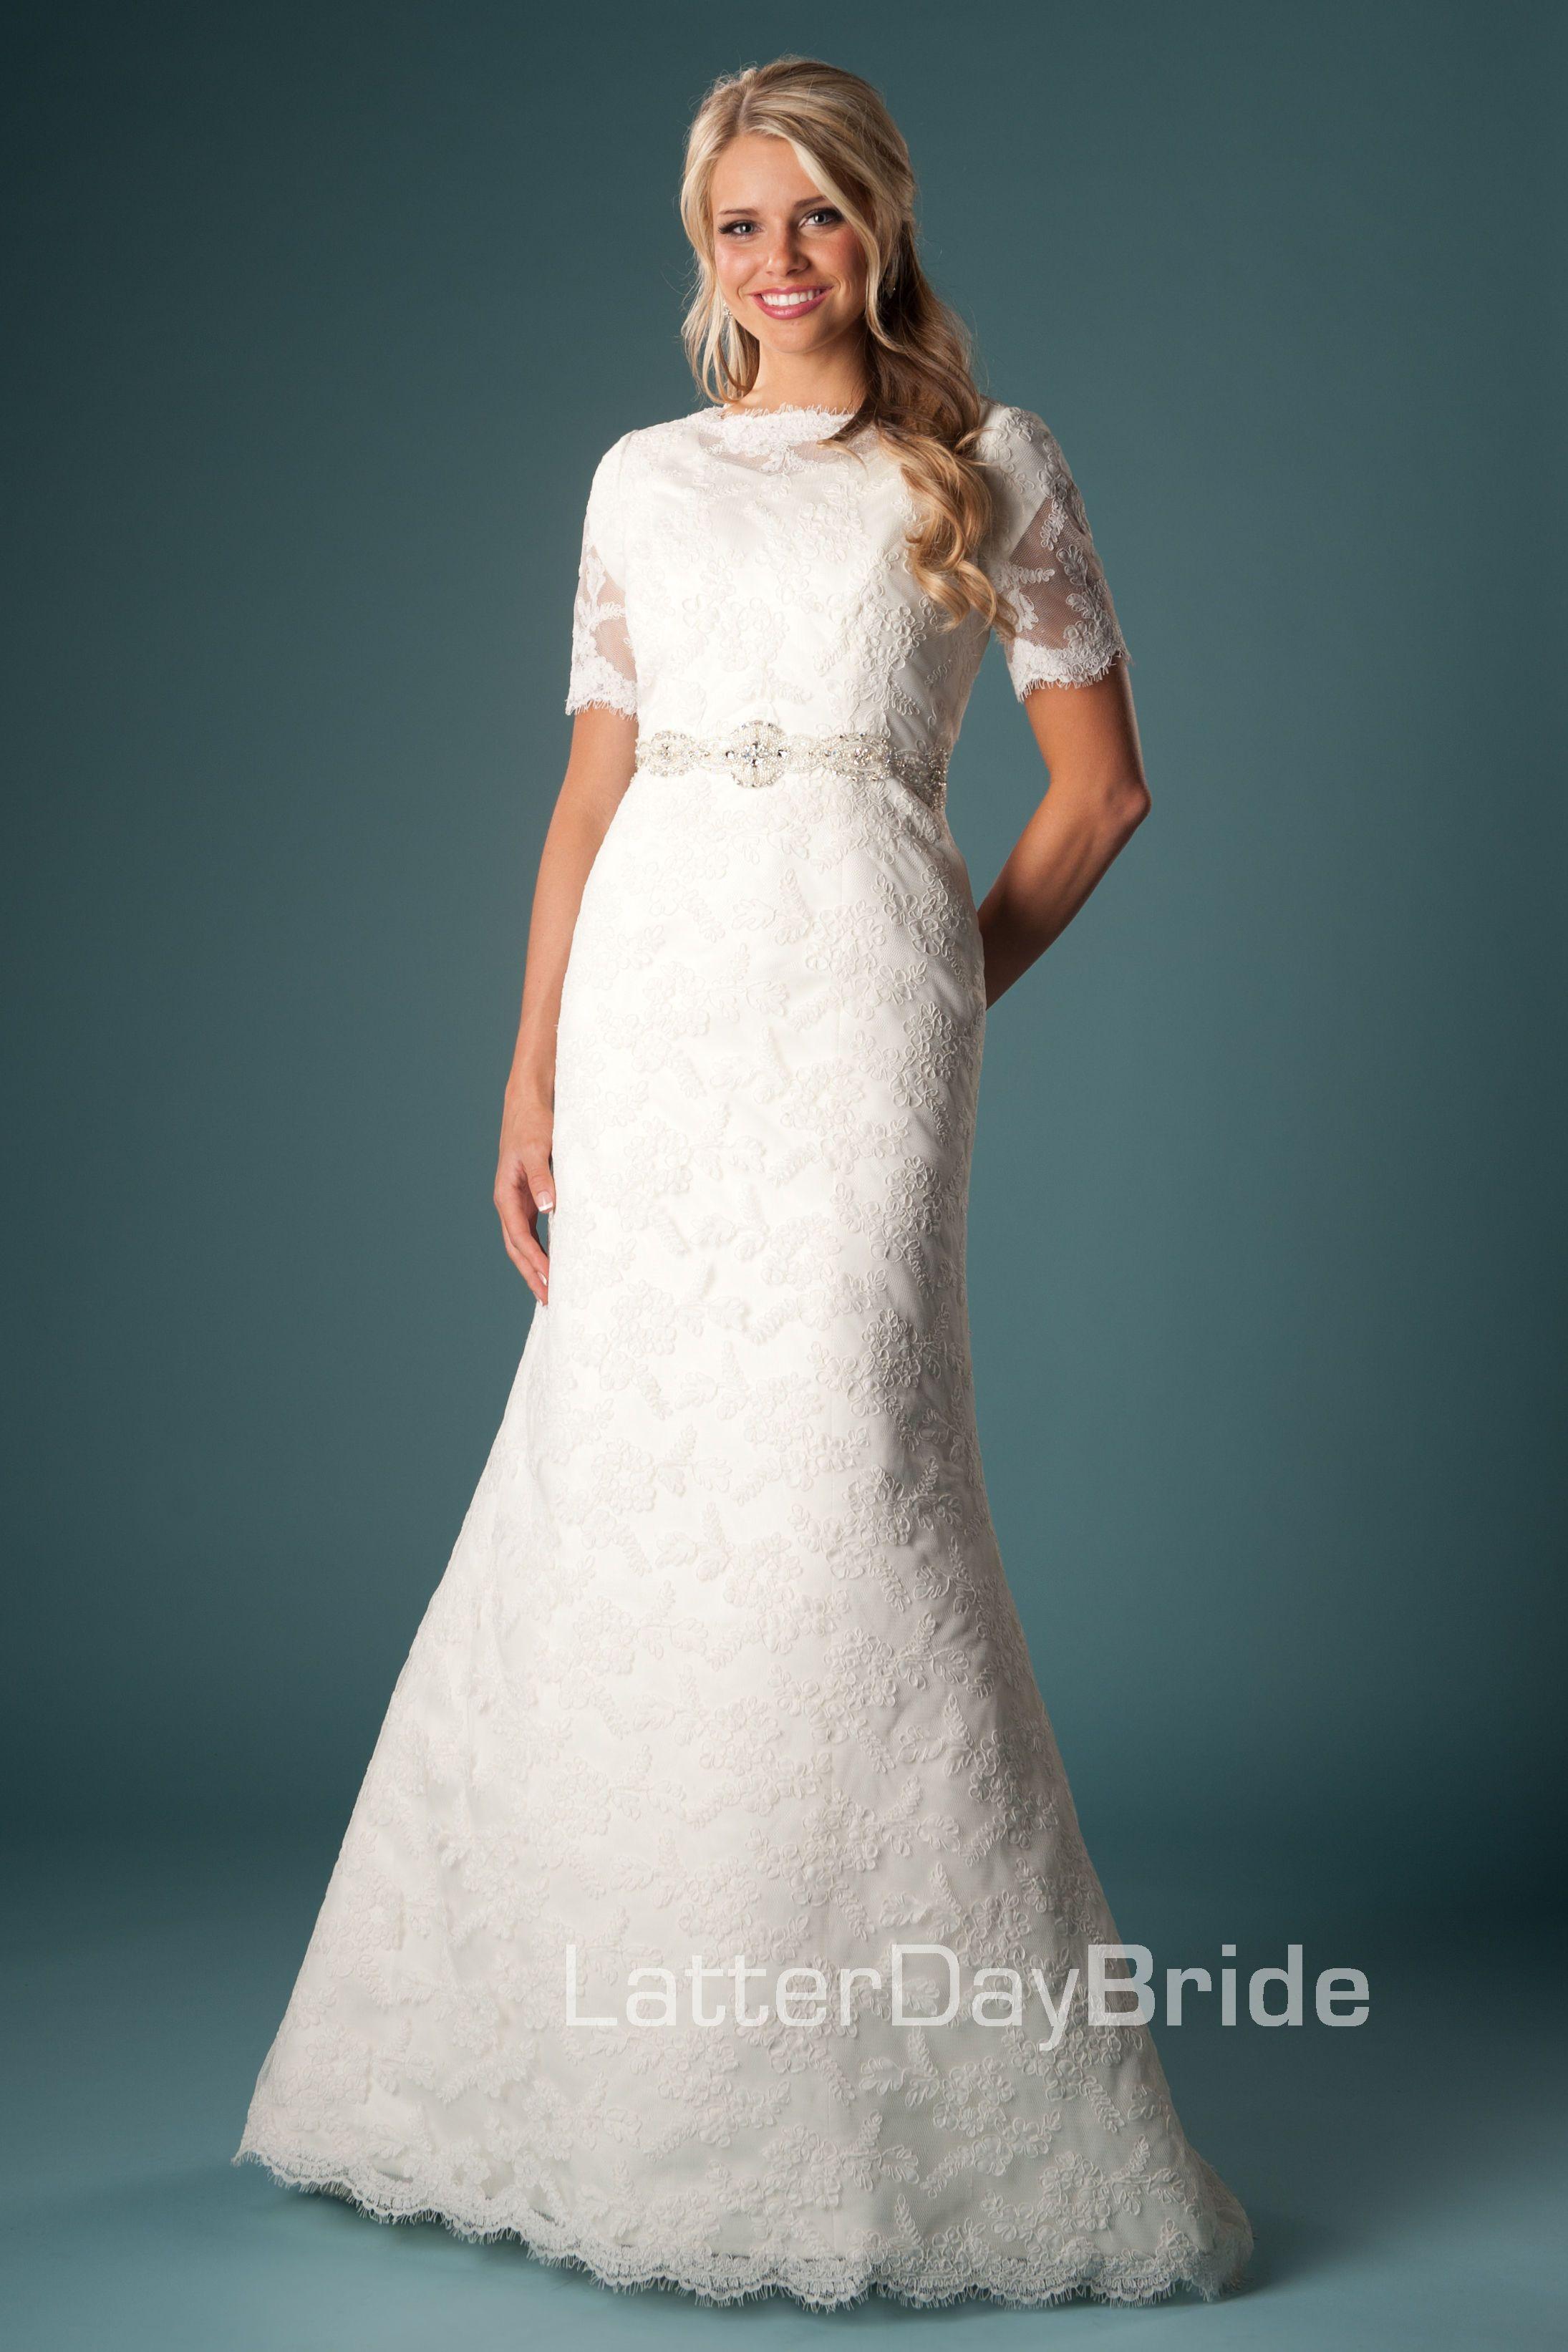 Modest Wedding Dress, Estelle | LatterDayBride & Prom | Wedding ...